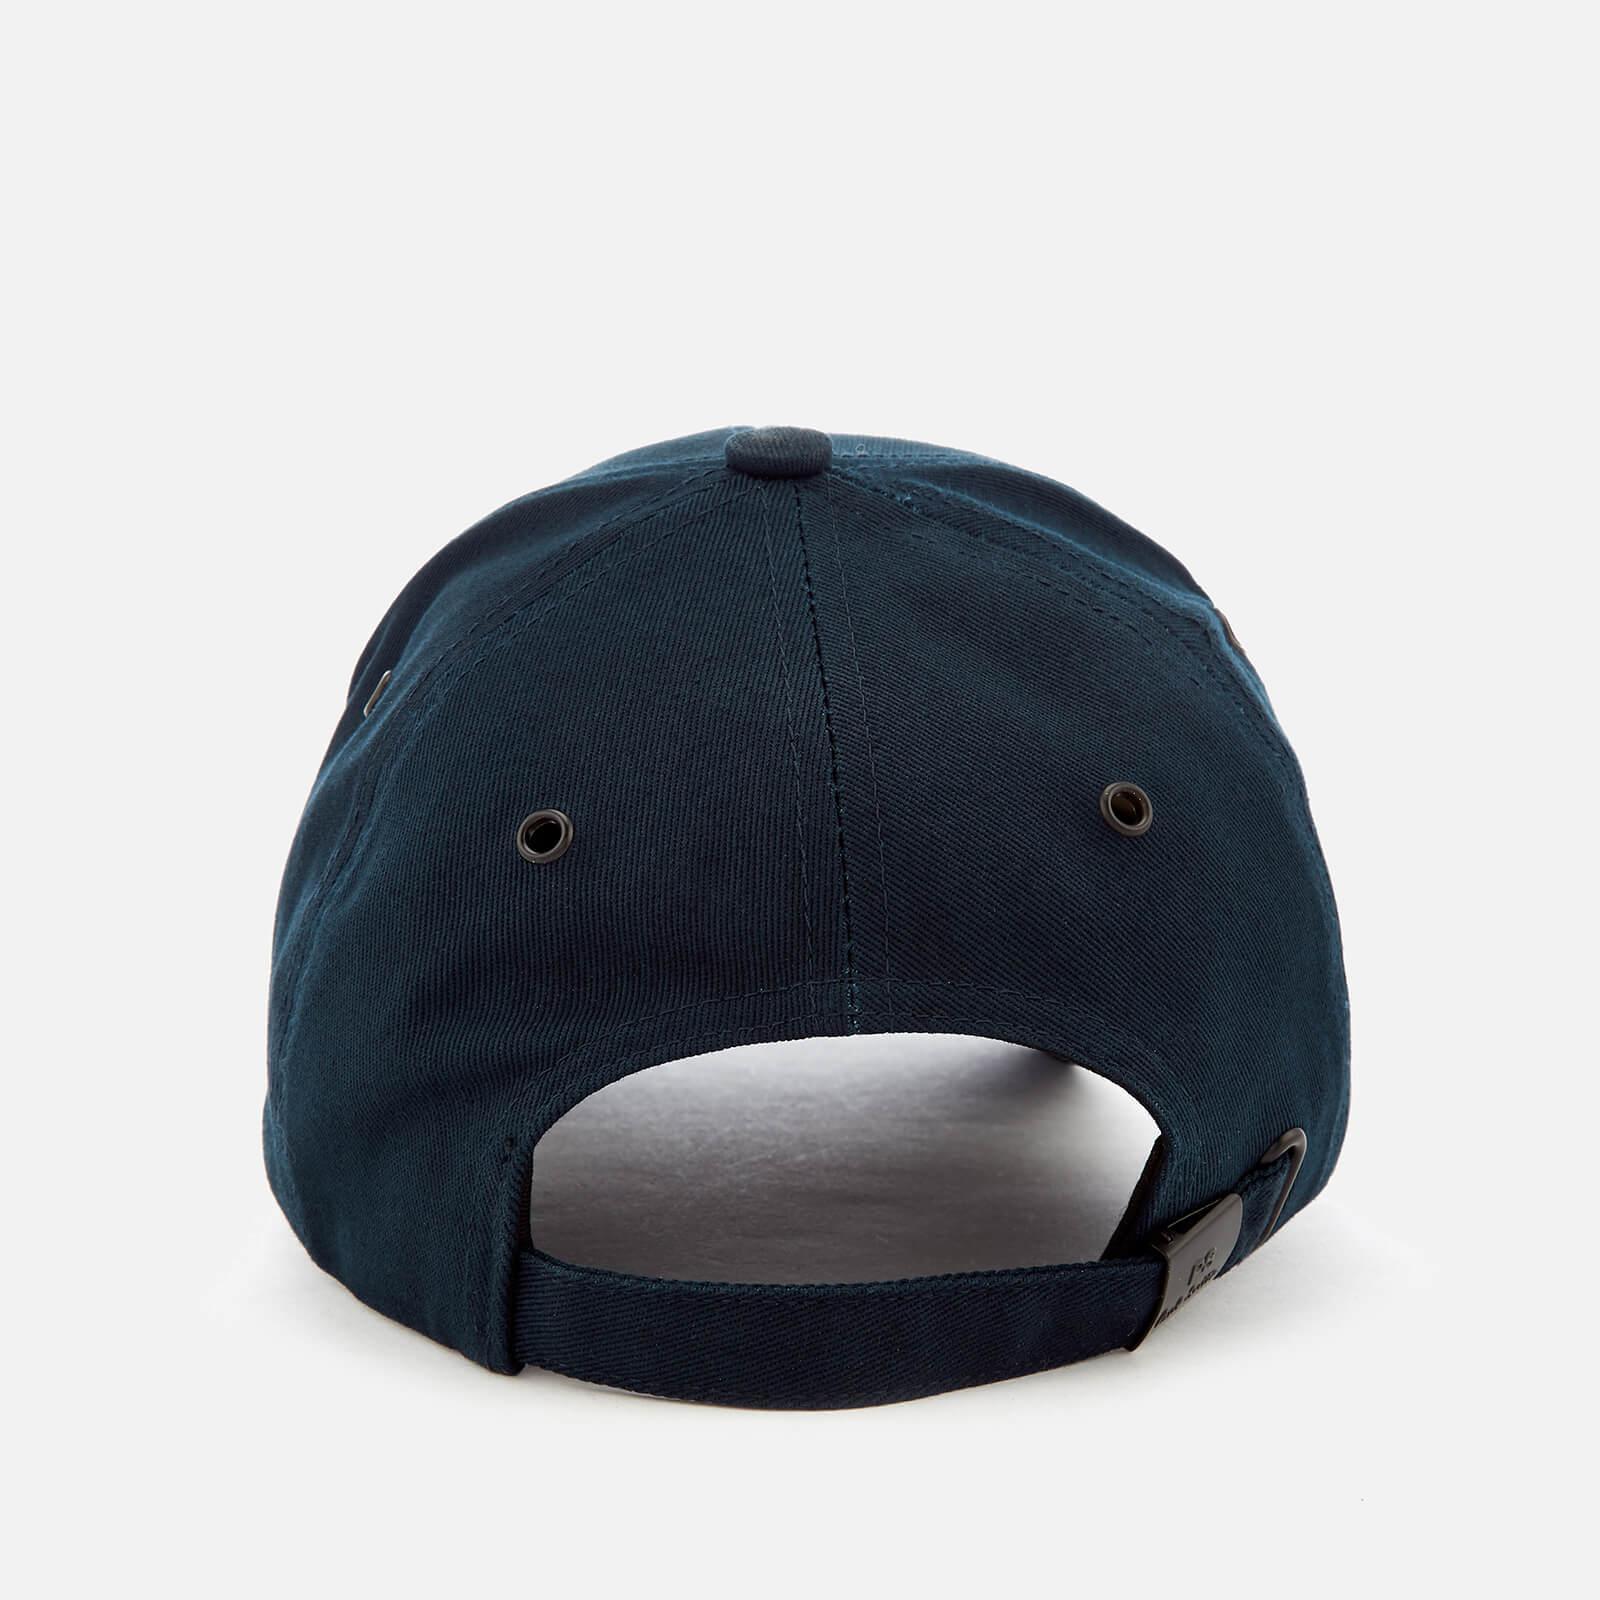 c71ad51ae6d PS by Paul Smith - Blue Zebra Baseball Cap for Men - Lyst. View fullscreen